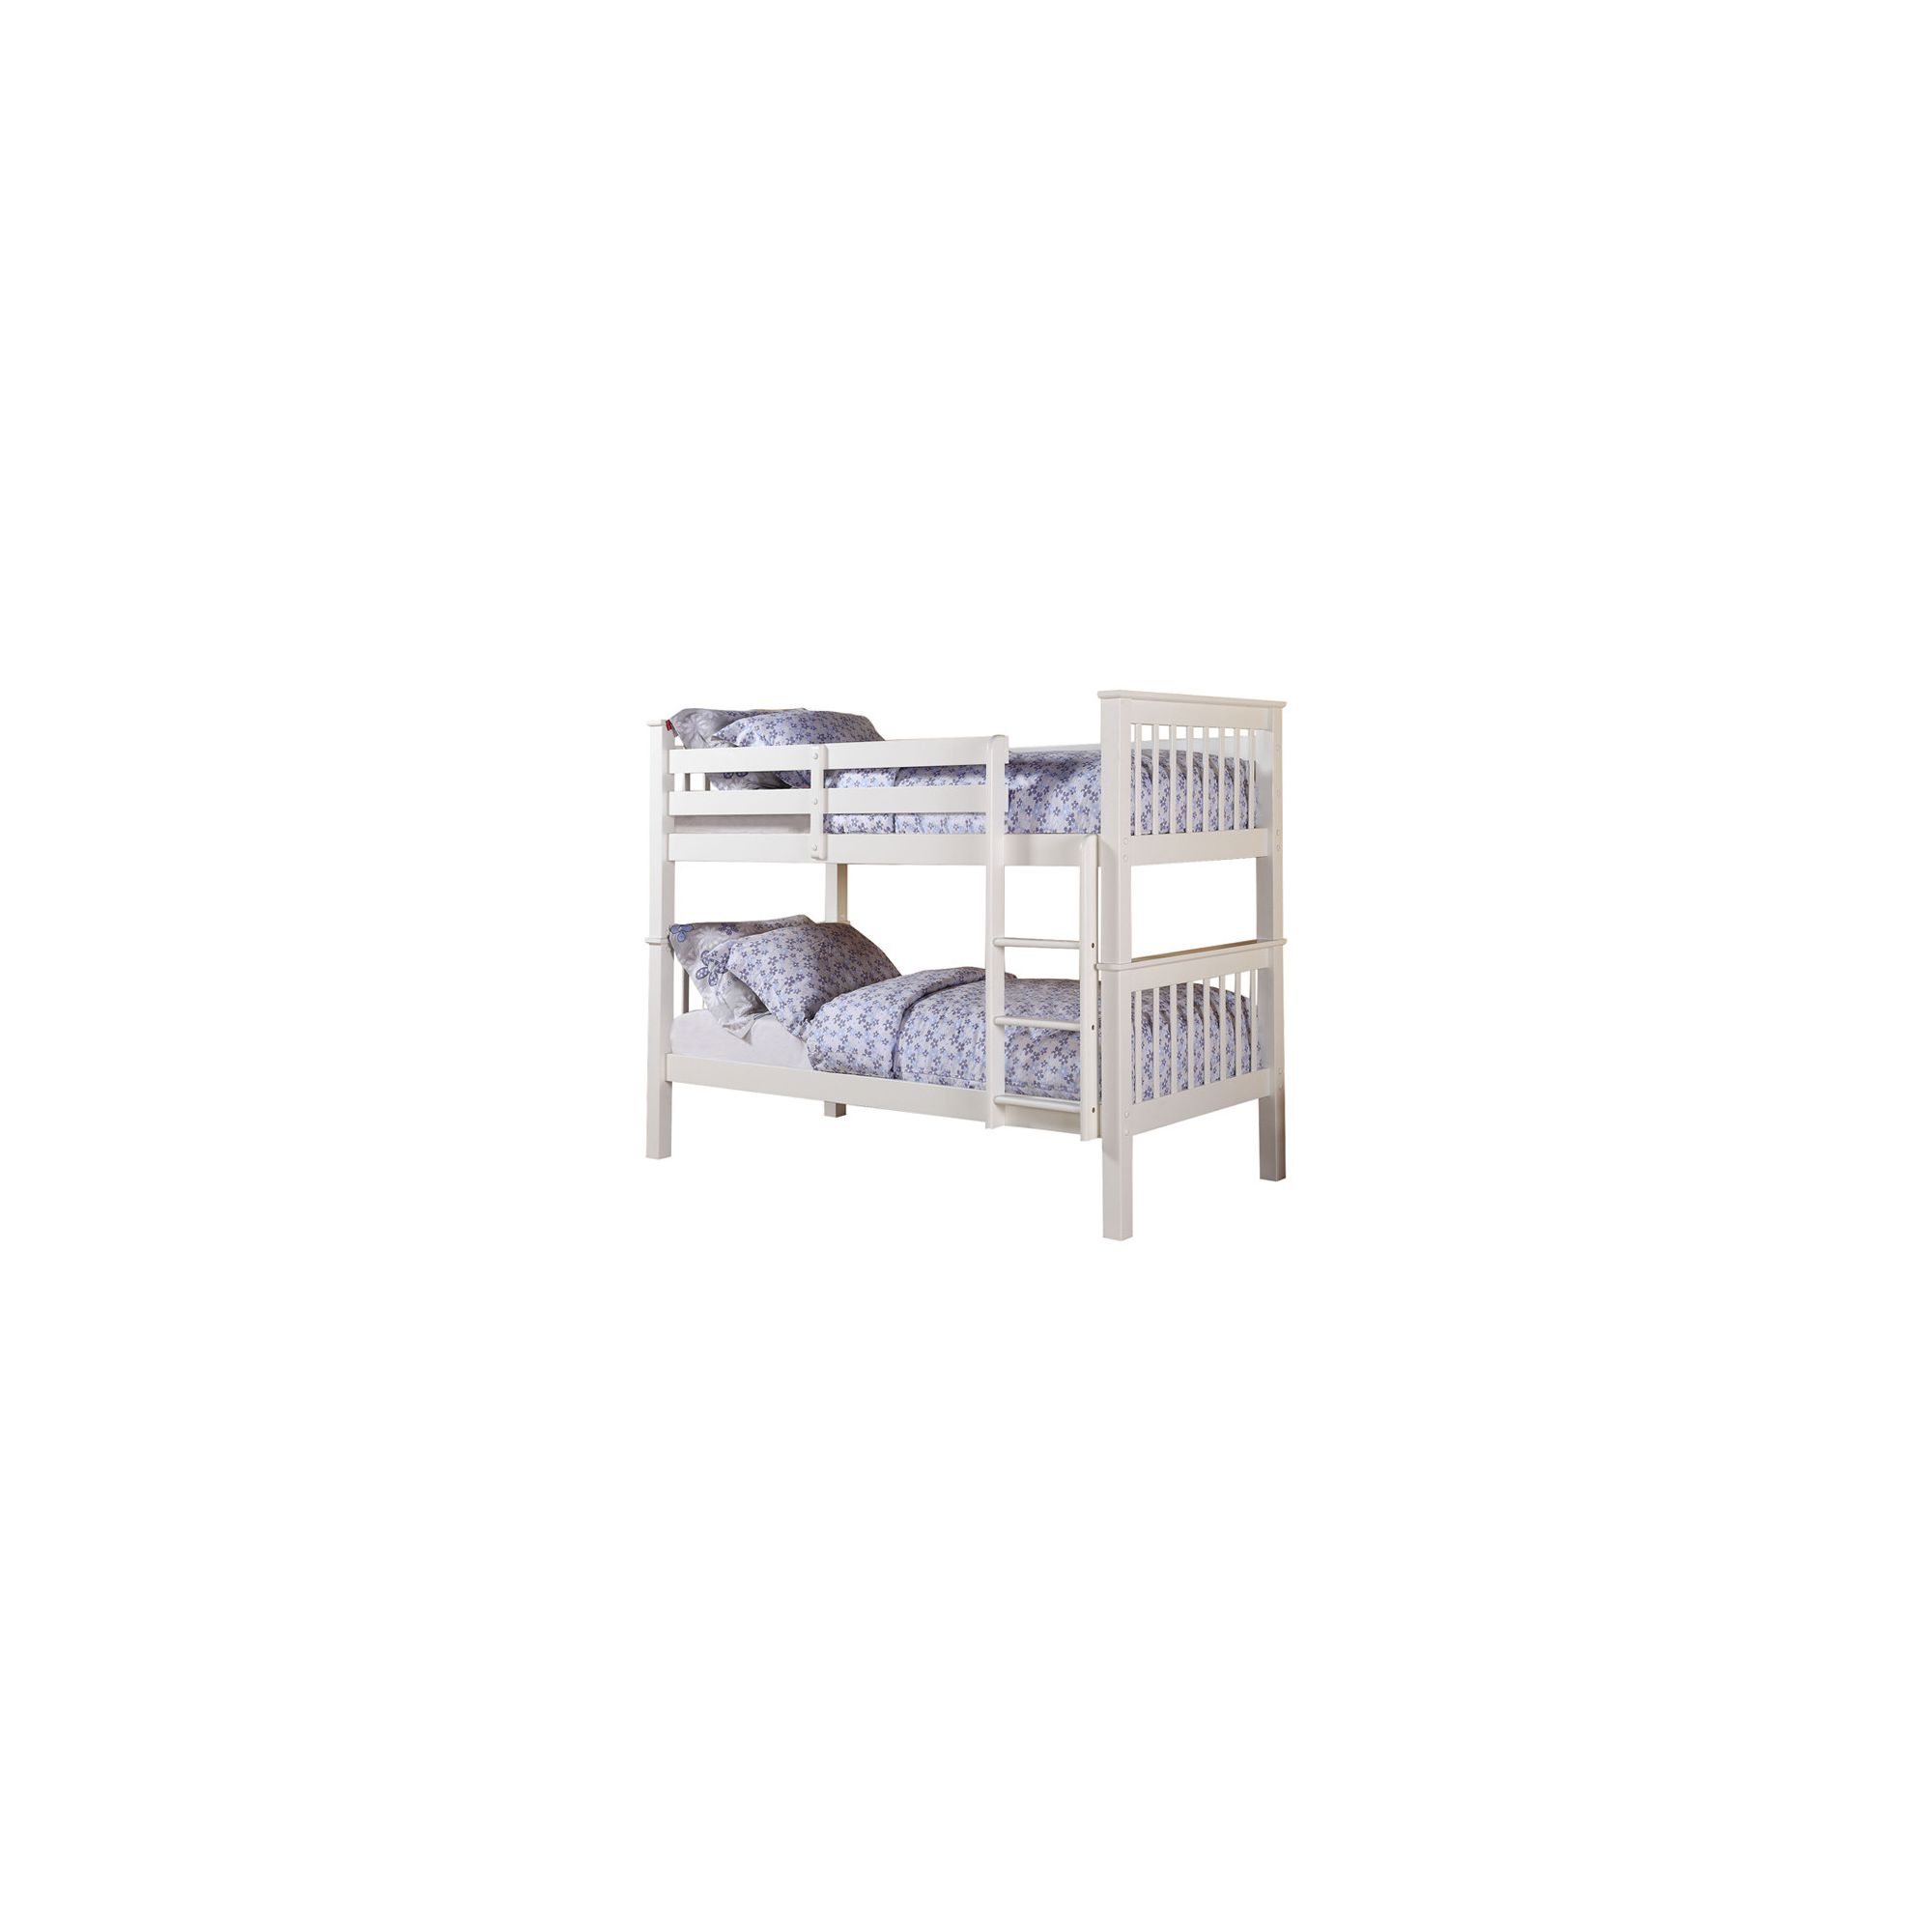 Altruna Devon Bunk Bed Frame - White at Tesco Direct